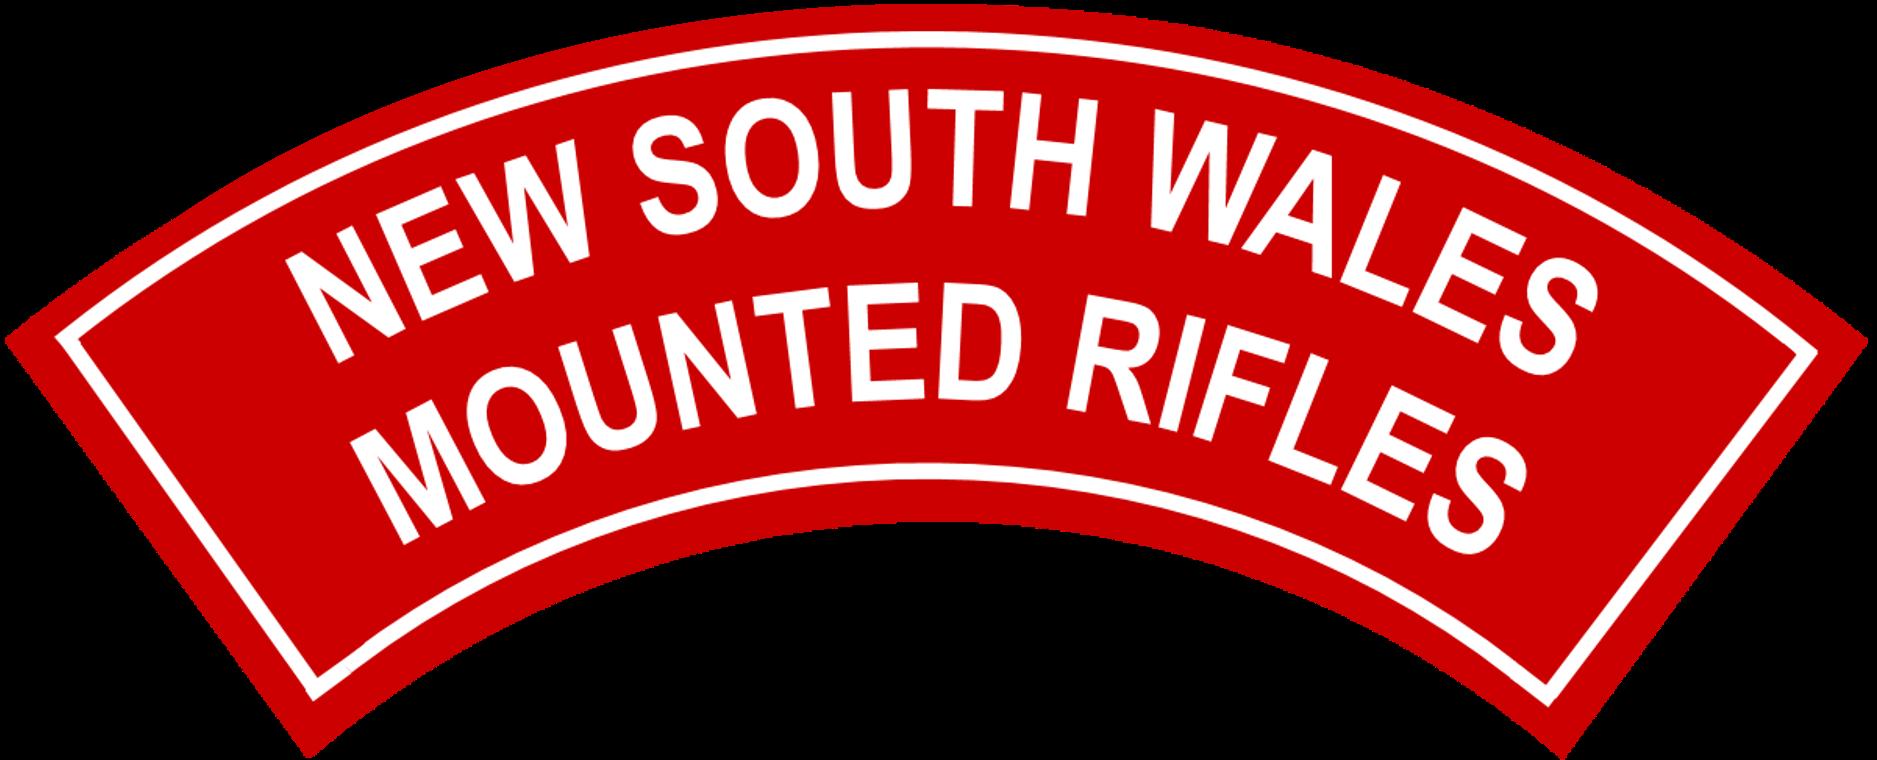 File:New South Wales Mounted Rifles battledress flash first pattern.